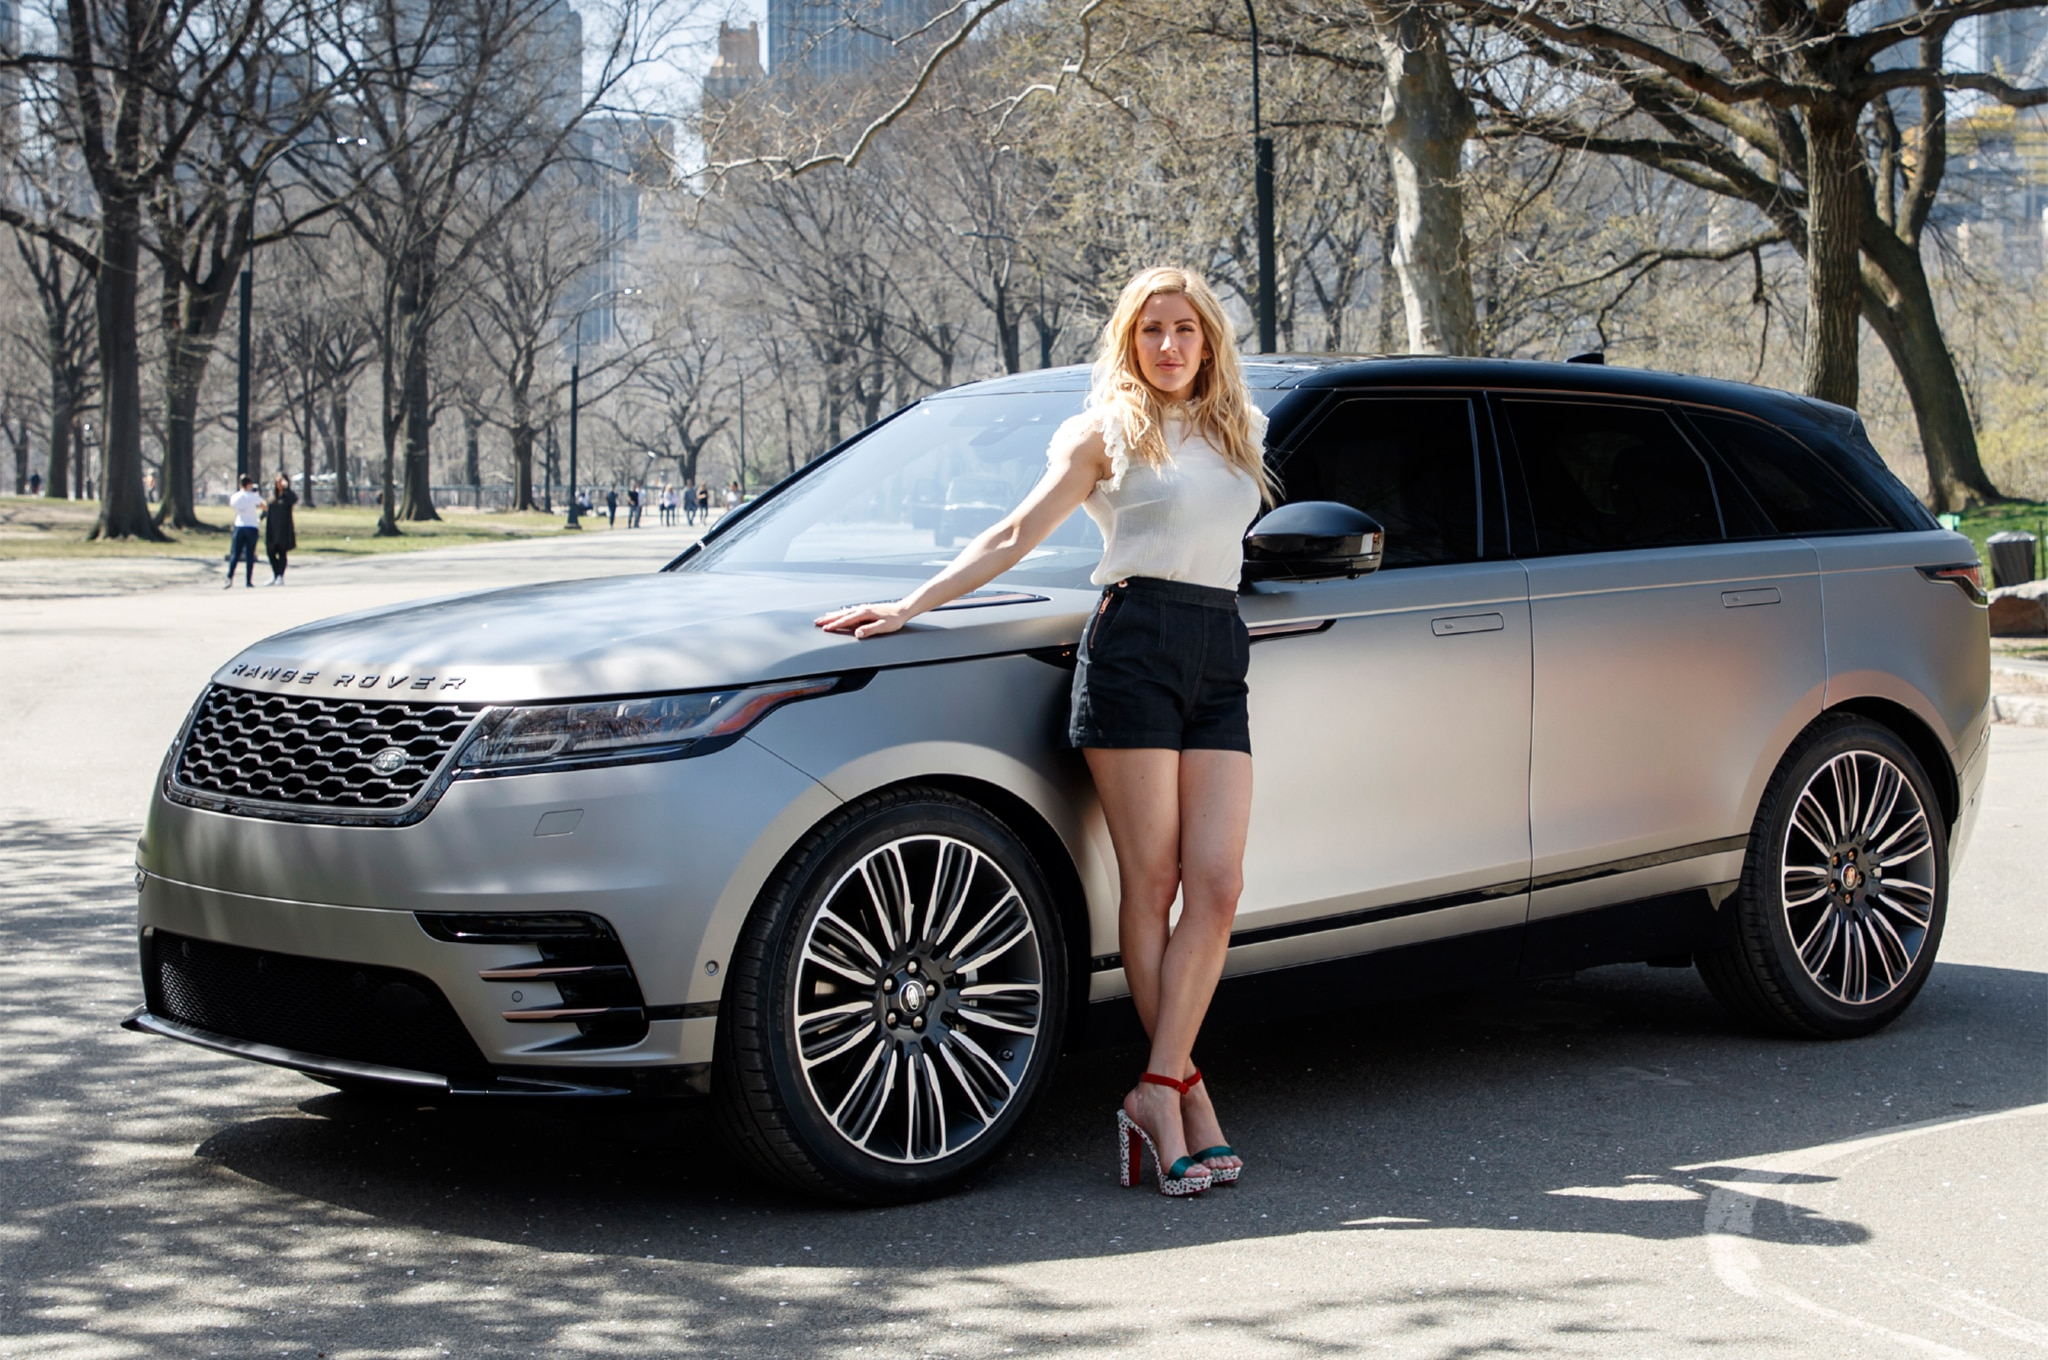 2018 Land Rover Range Rover Velar With Ellie Goulding 04